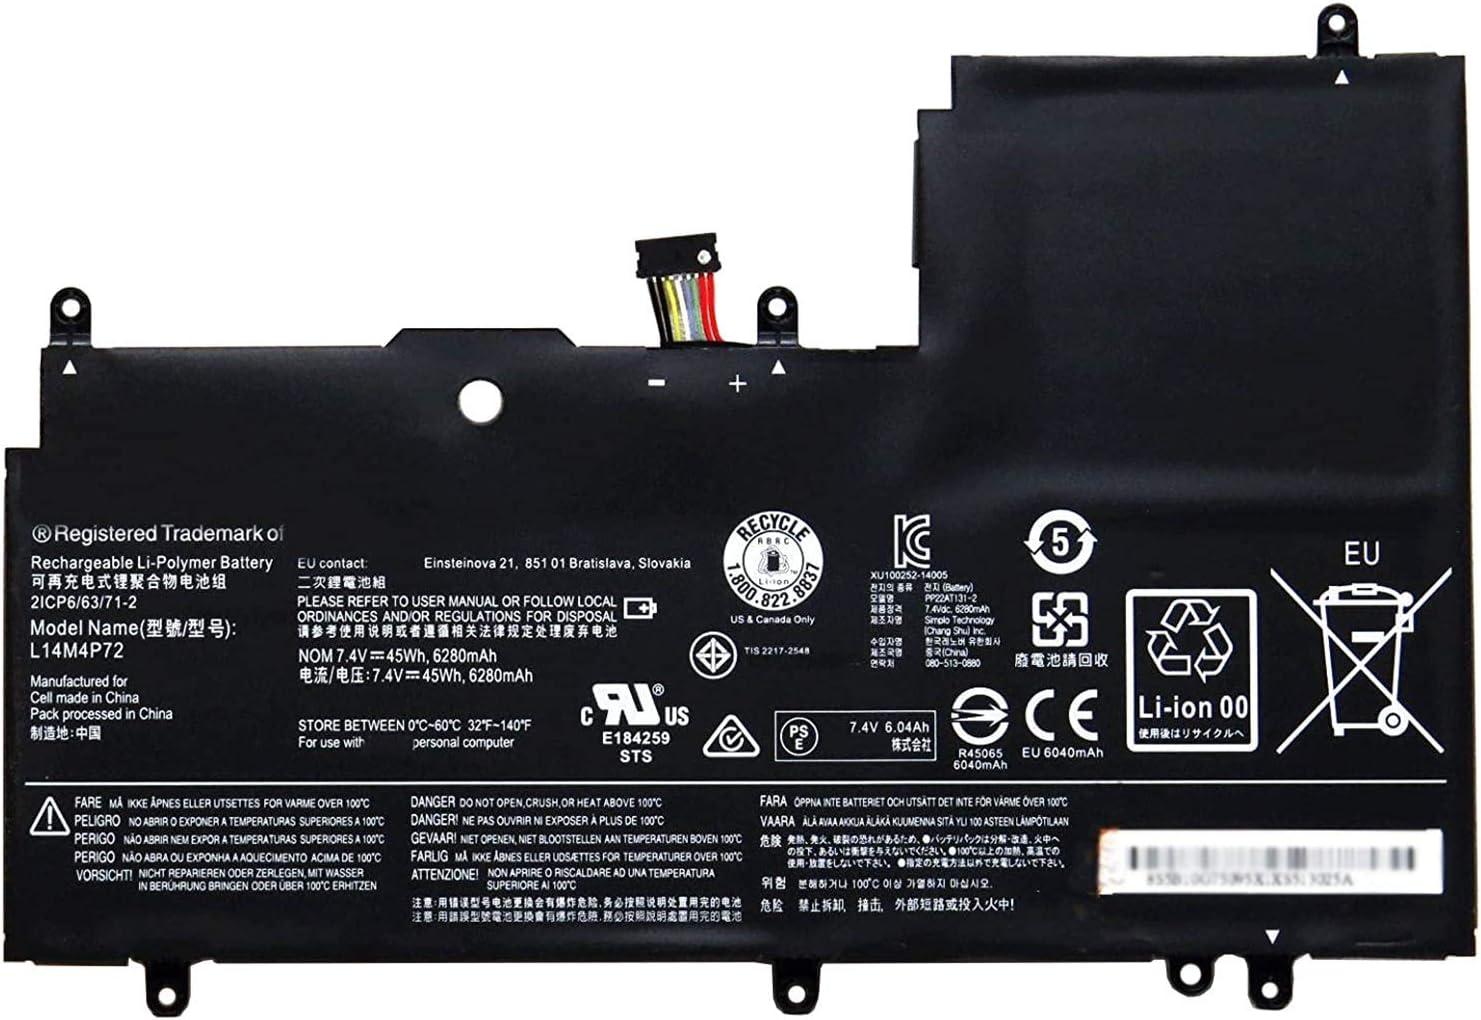 Dentsing L14M4P72 (7.4V 45Wh/6280mAh 4-Cells) Laptop Battery Compatible with Lenovo Yoga 3-1470 Yoga Ideapad 700 700-14ISK Series Notebook 5B10G75095 5B10K10224 L14S4P72 5B10G84689 5B10K10226